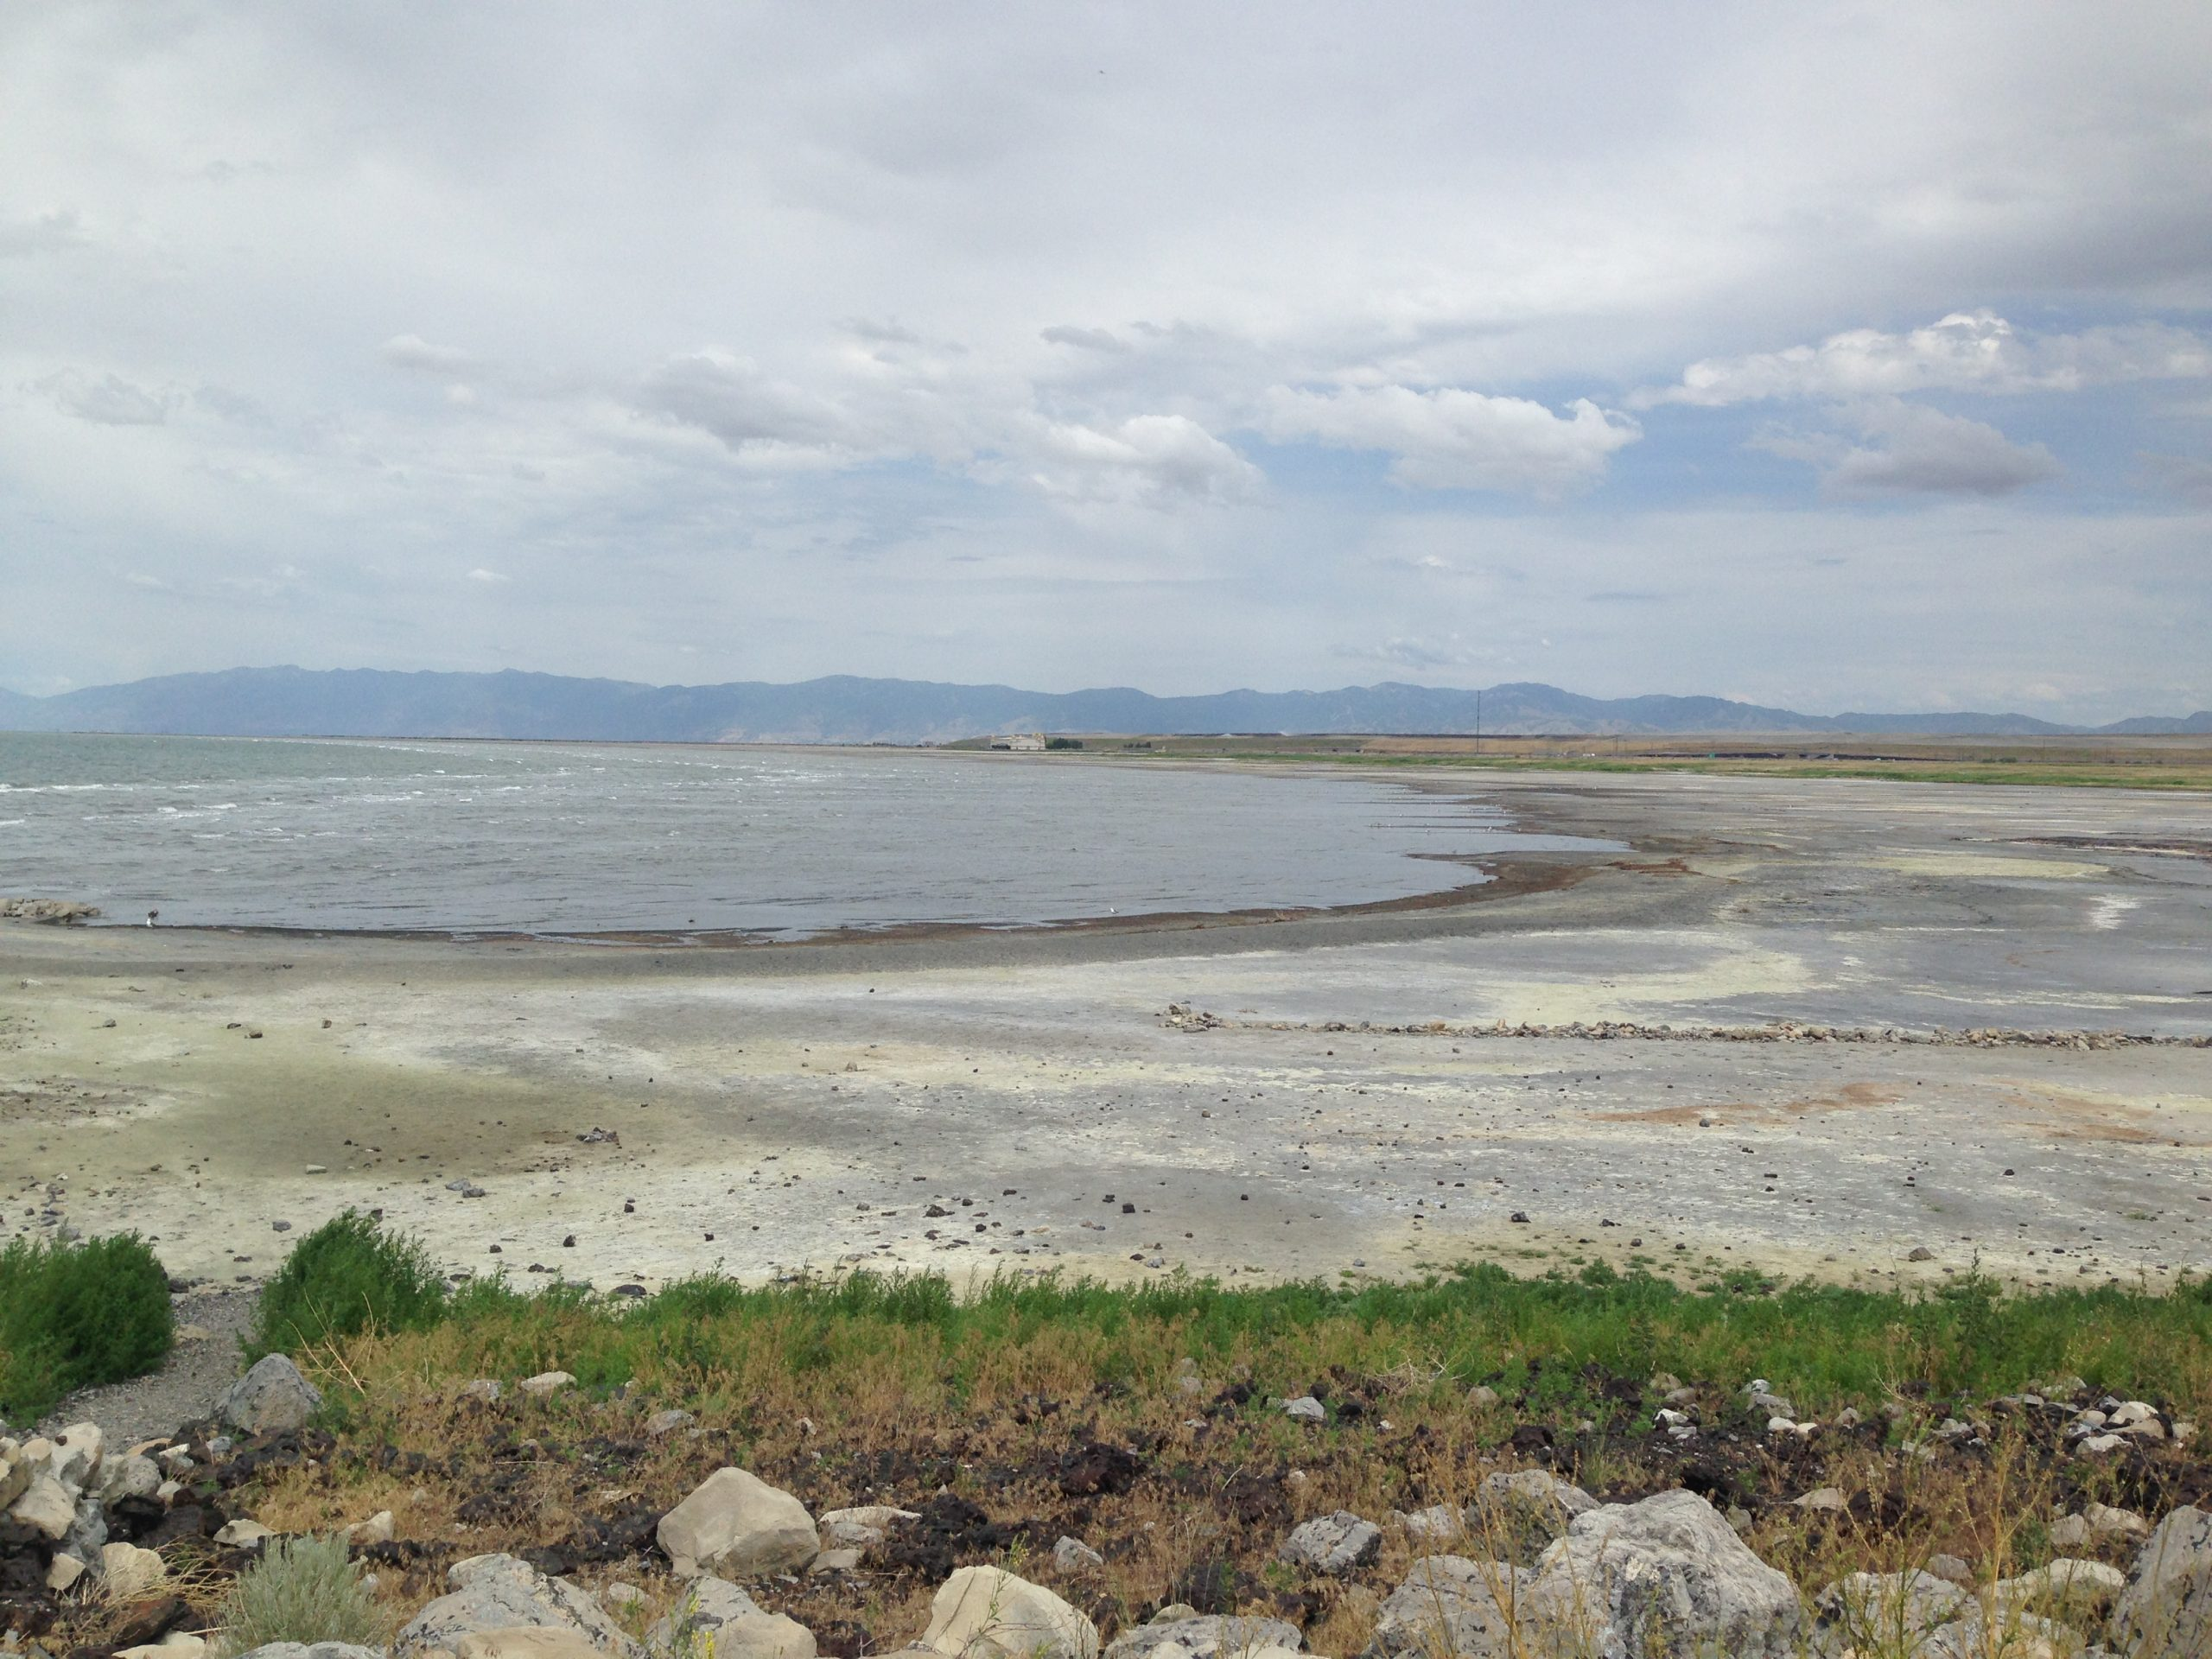 Days 24-26: Utah (Part 6)